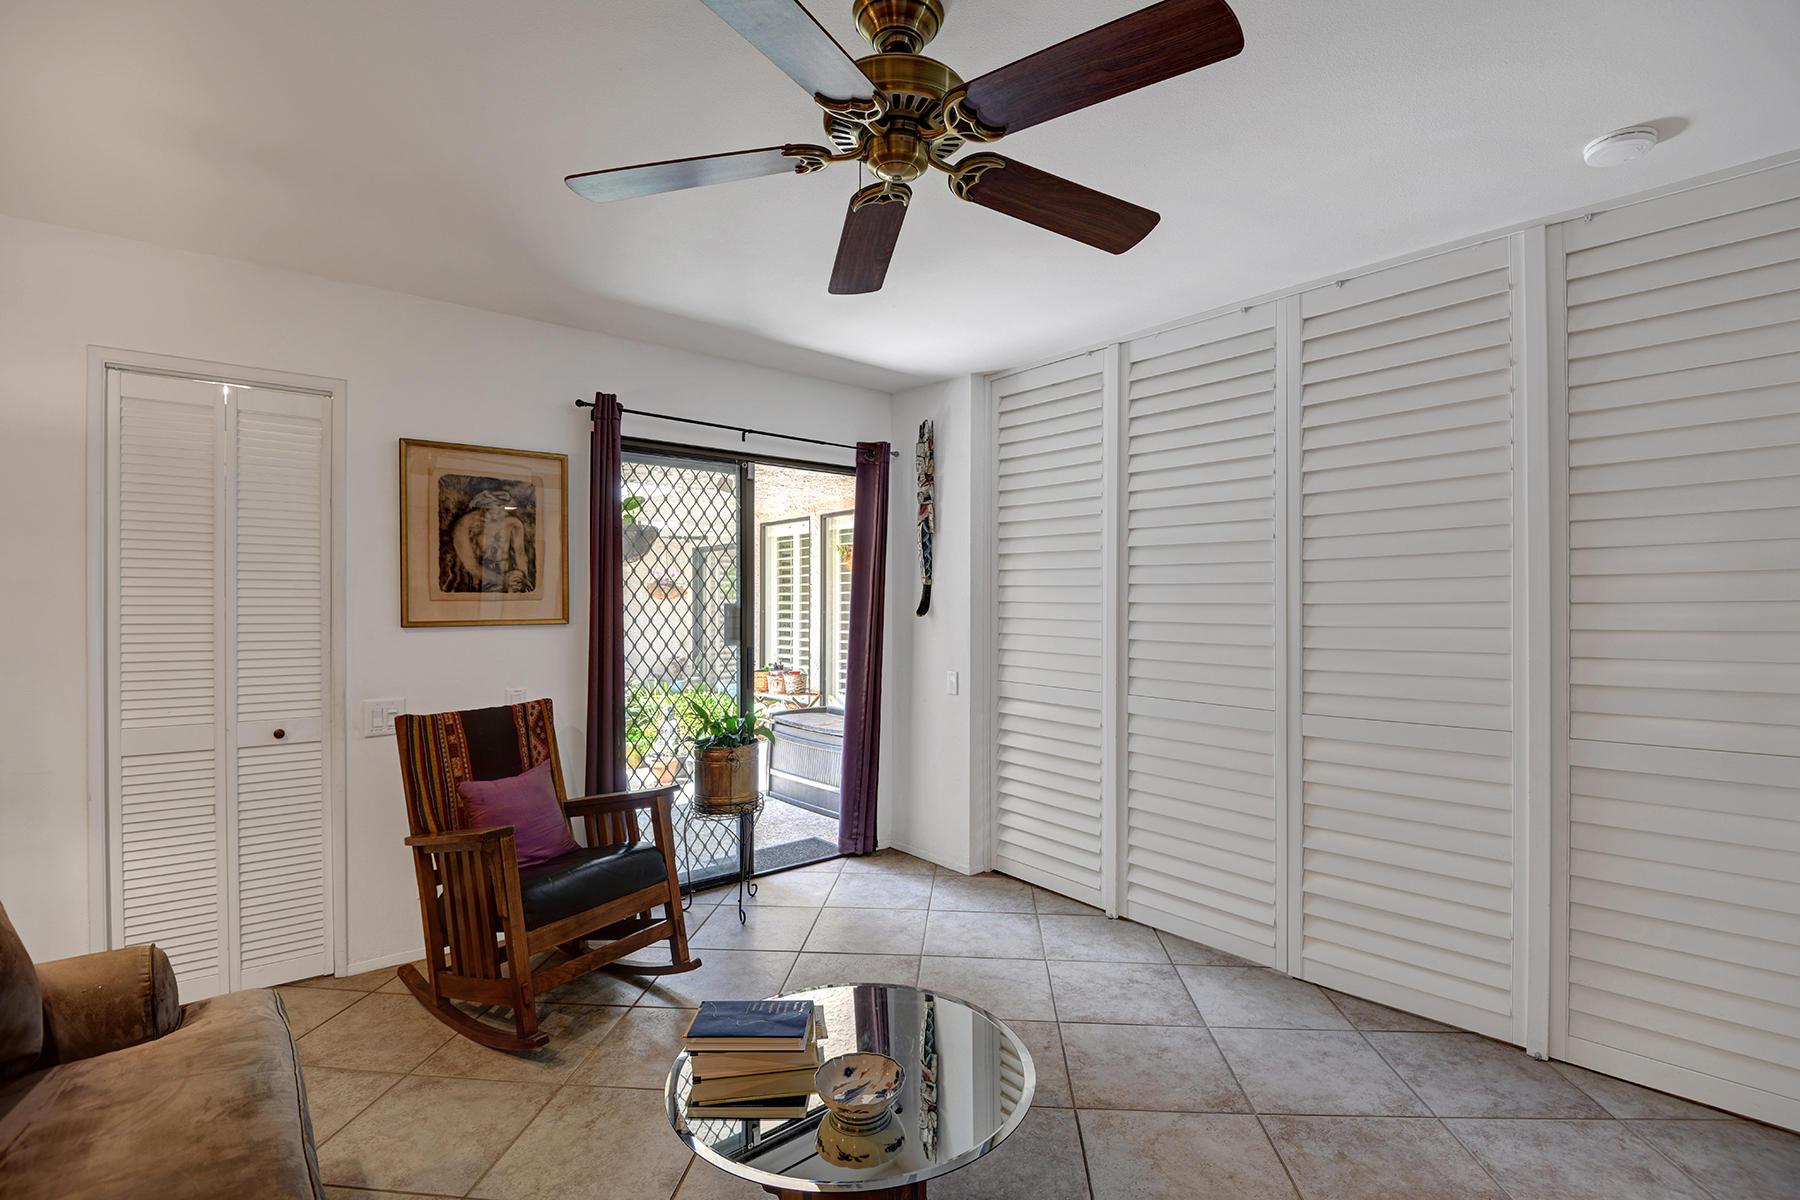 1561 S Cerritos Drive, Palm Springs, California 92264, 3 Bedrooms Bedrooms, ,2 BathroomsBathrooms,Residential,For Sale,1561 S Cerritos Drive,219041562